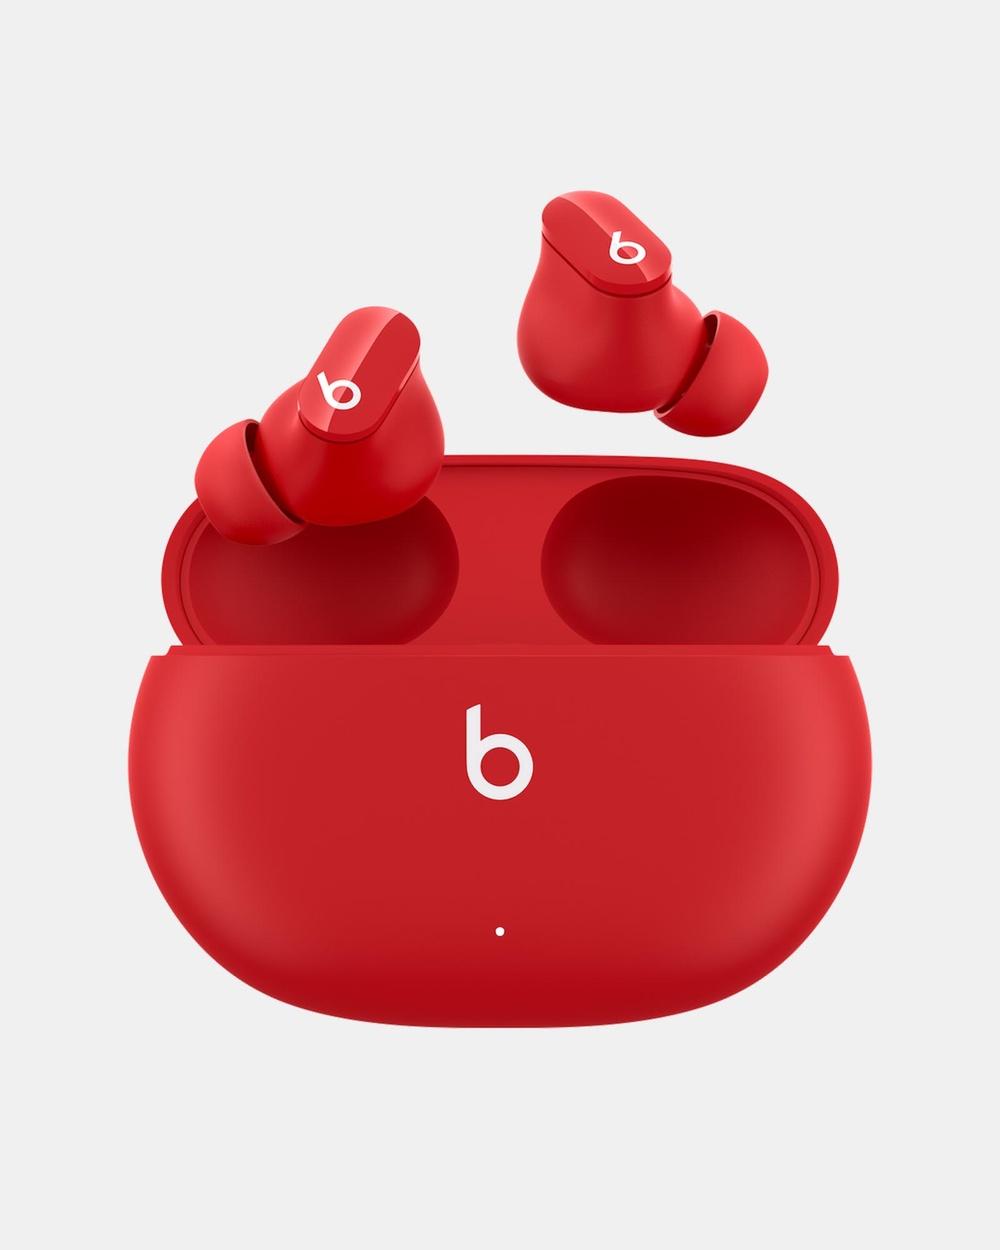 Beats by Dr. Dre Studio Buds True Wireless Noise Cancelling Earphones Tech Accessories Red